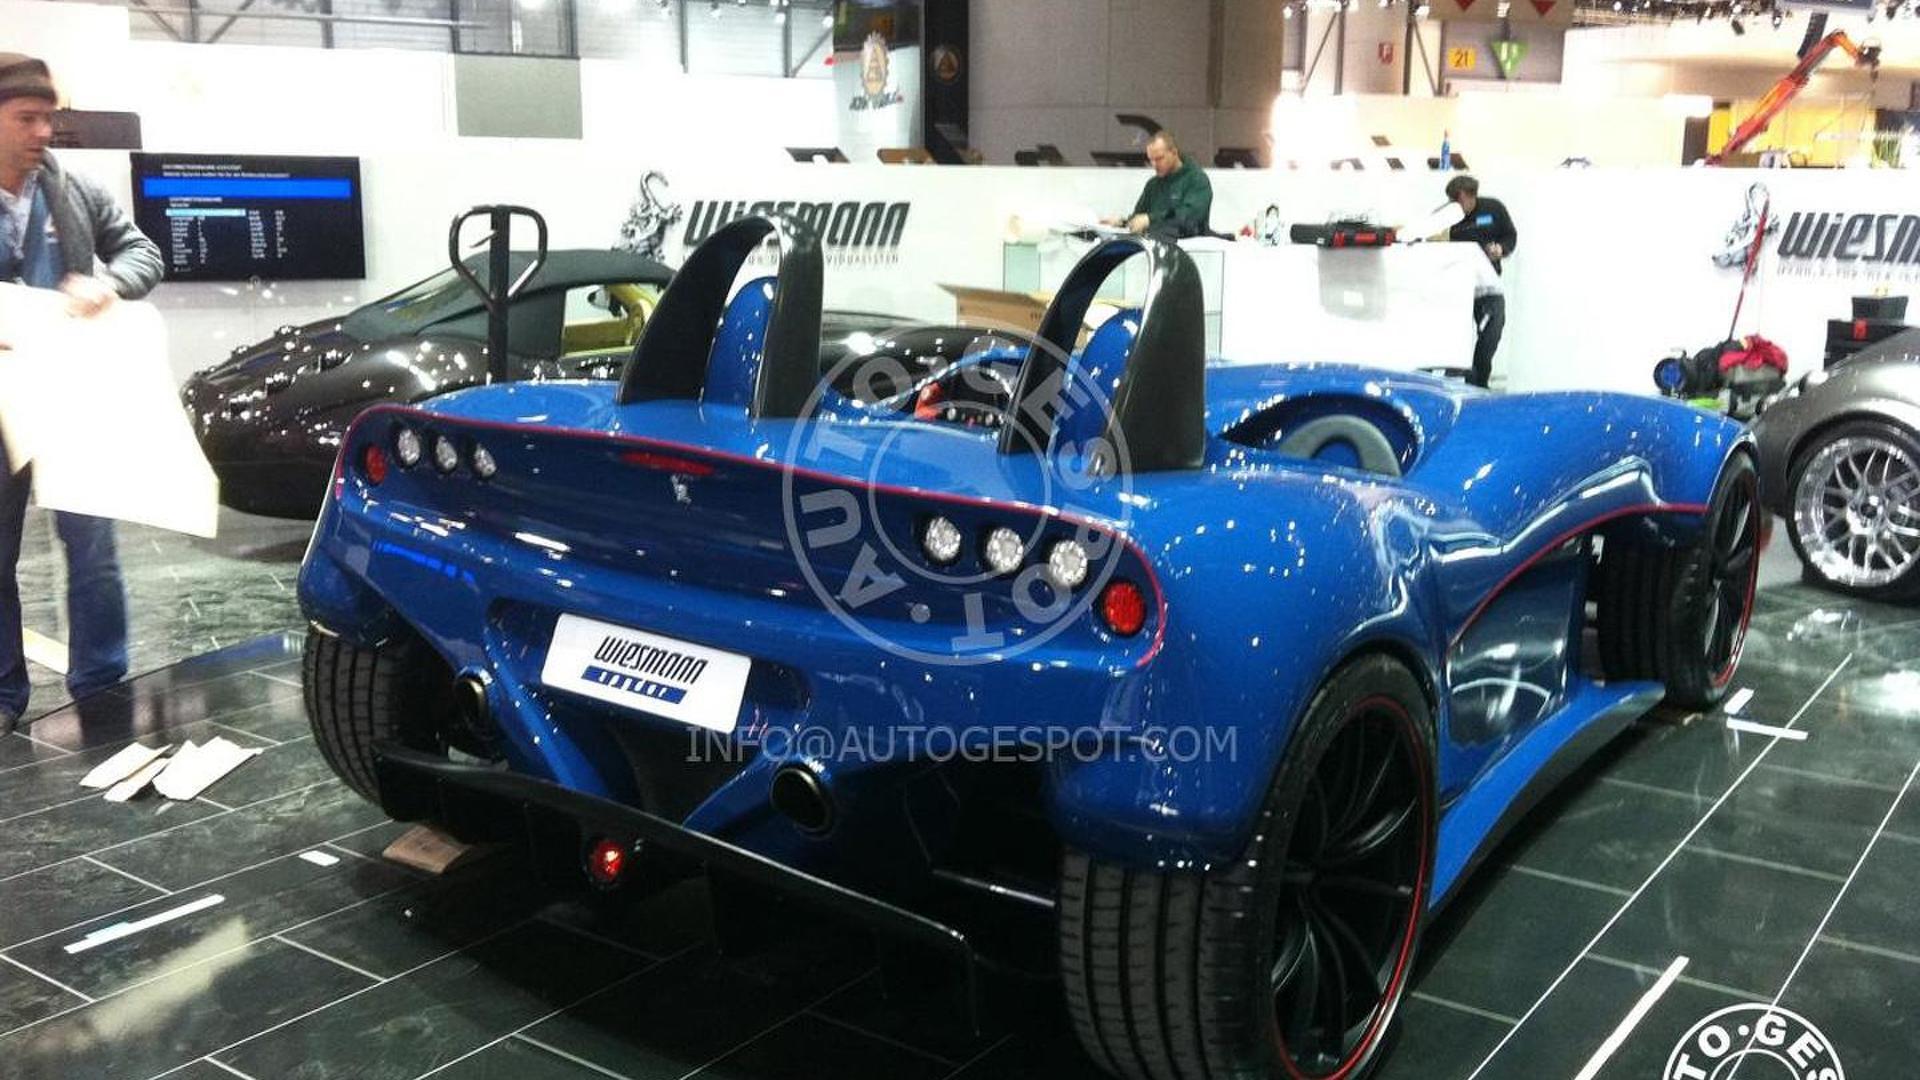 Wiesmann Spyder Concept caught on Geneva show room floor